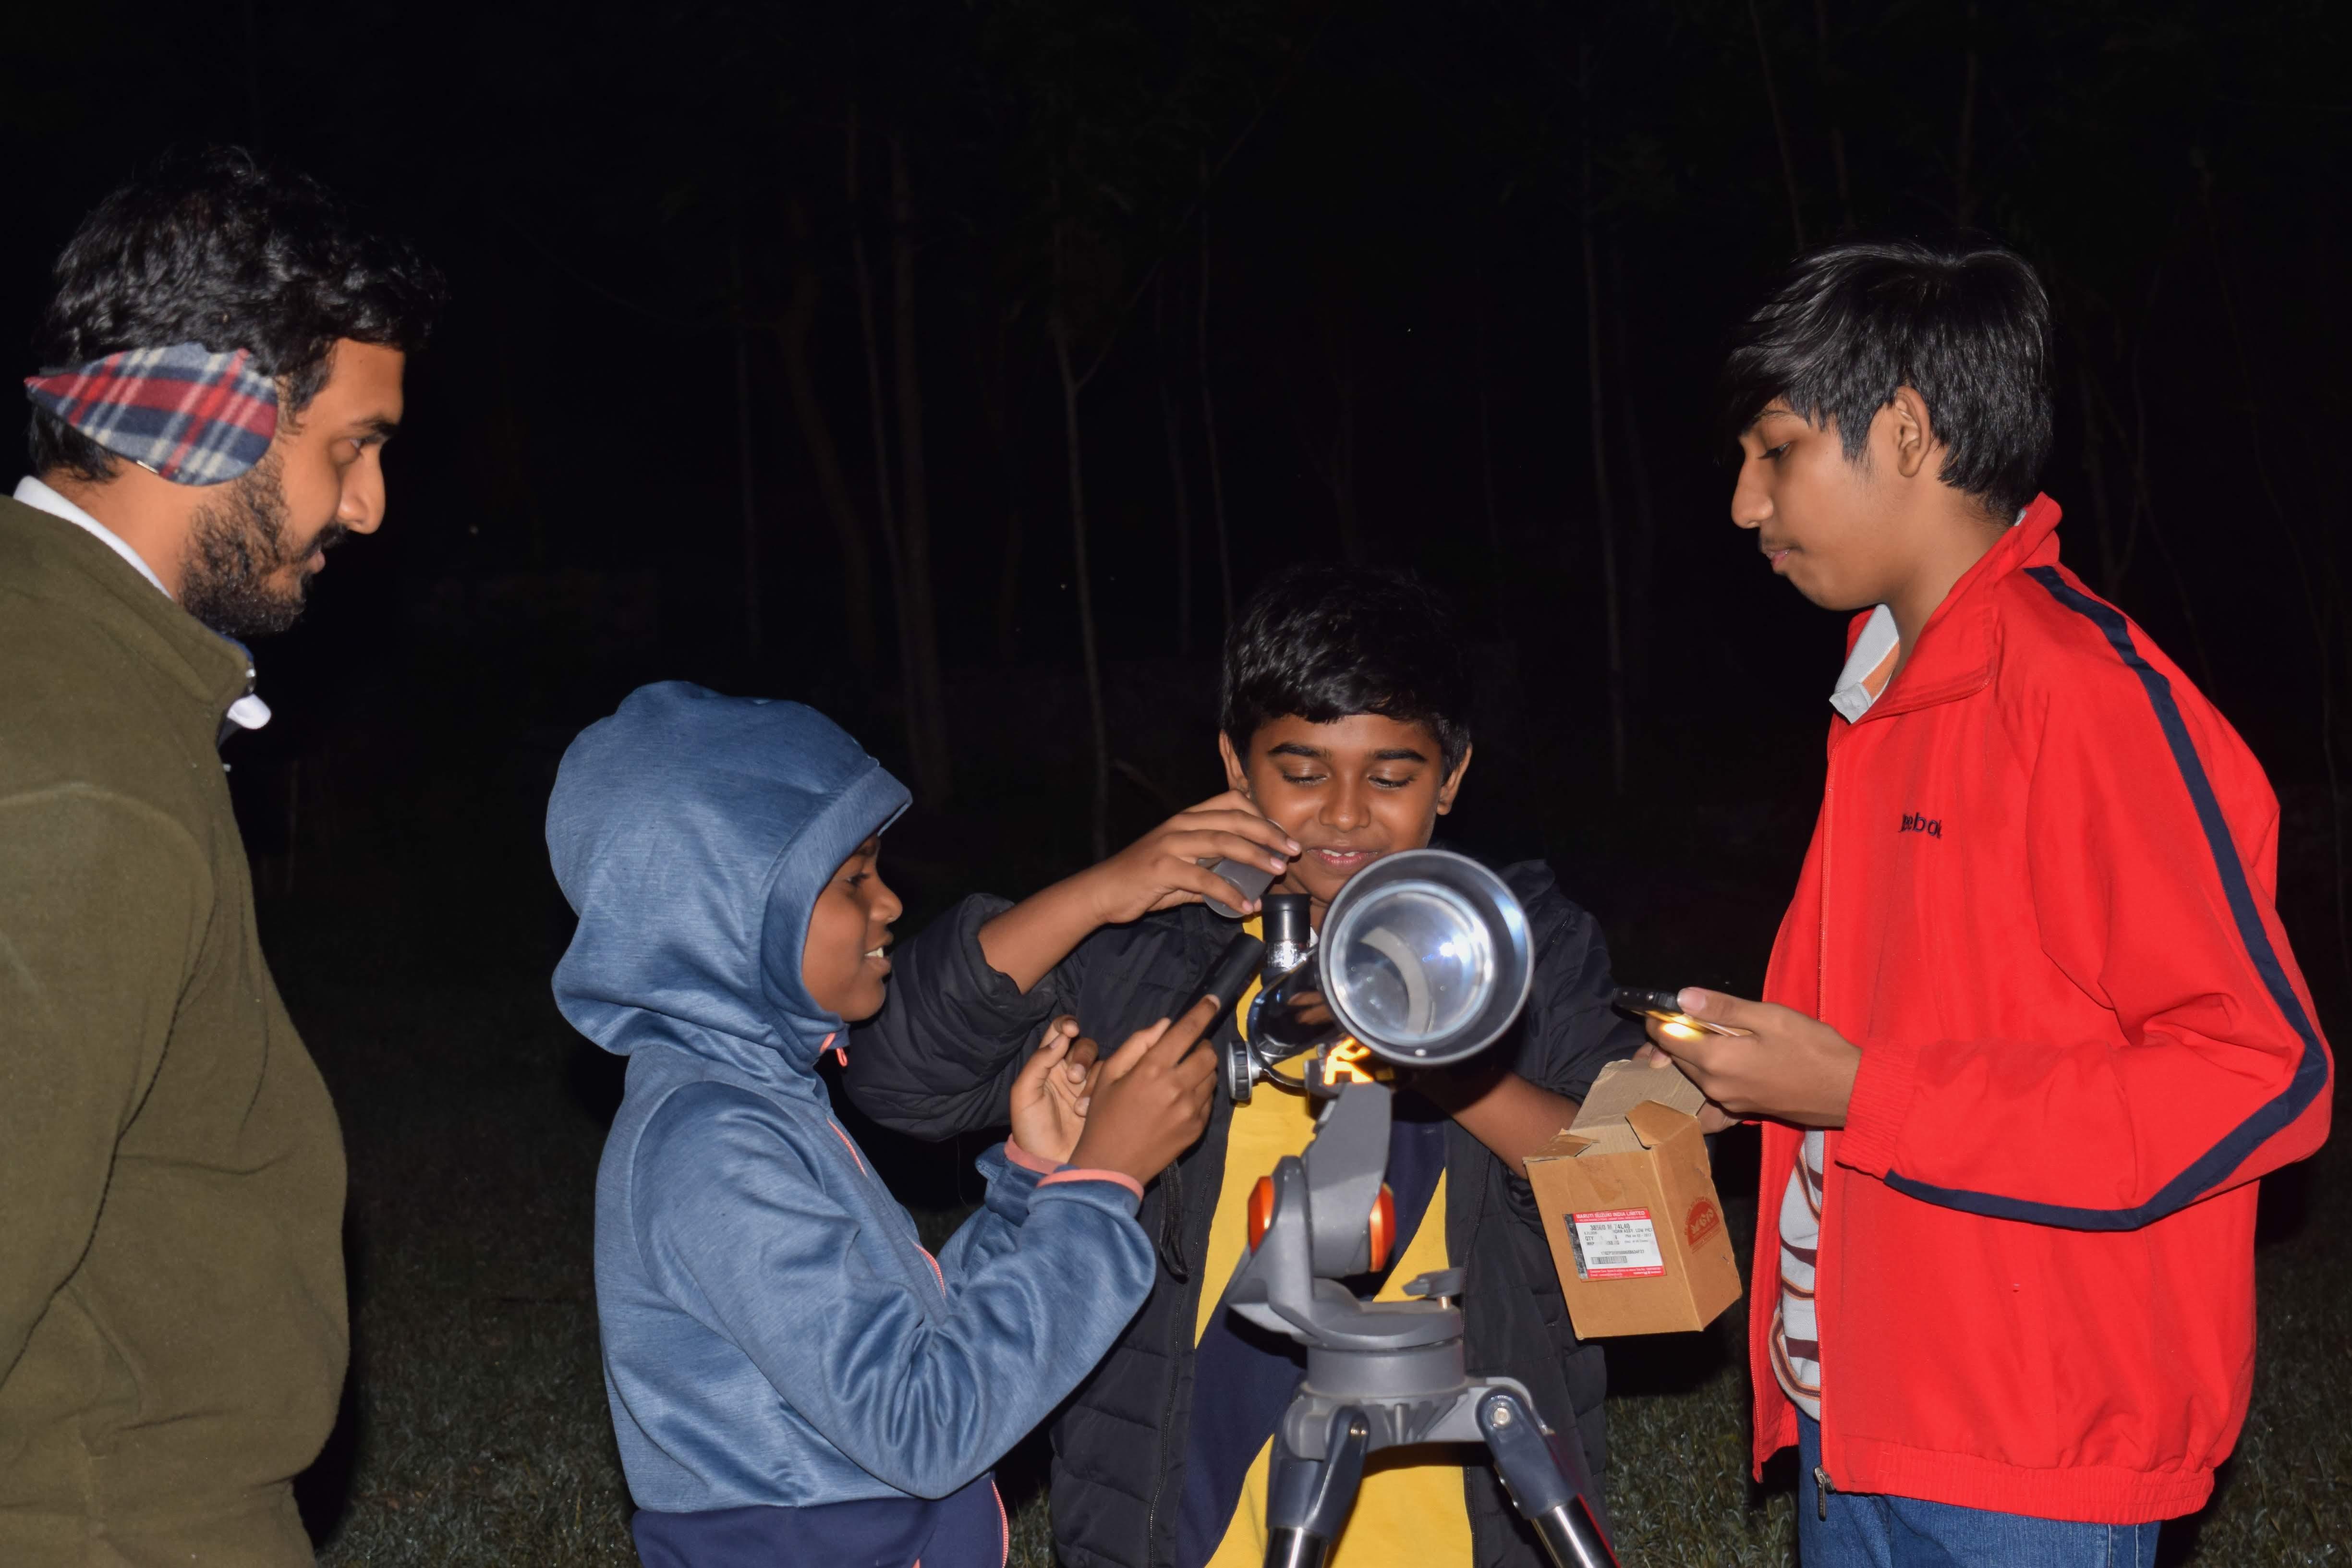 Astronomy camp - kids setup telescope